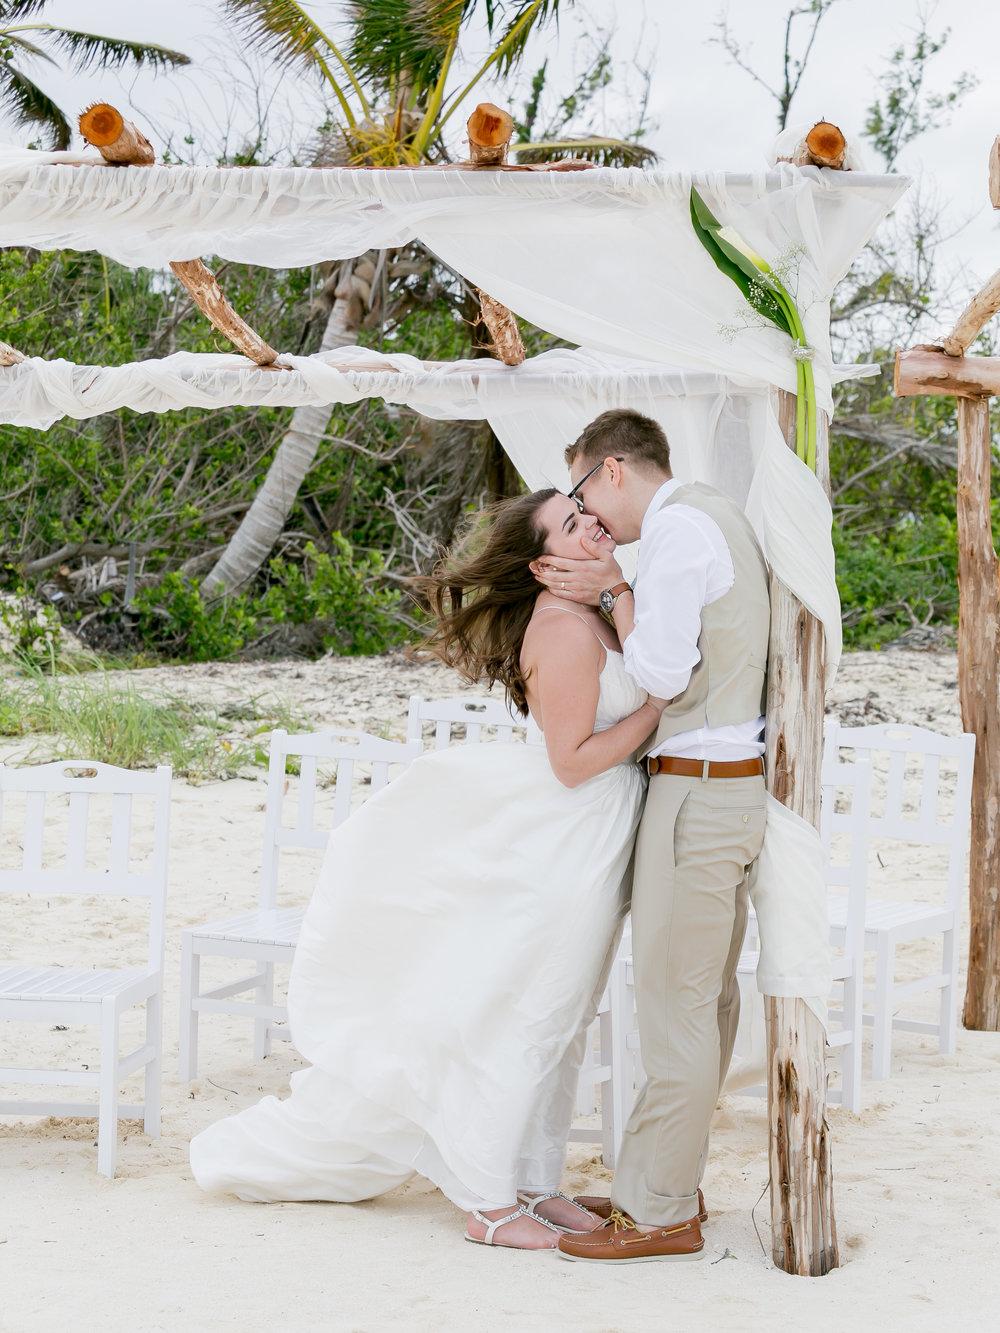 Cayco-Coco-Cuba-Wedding-448.jpg